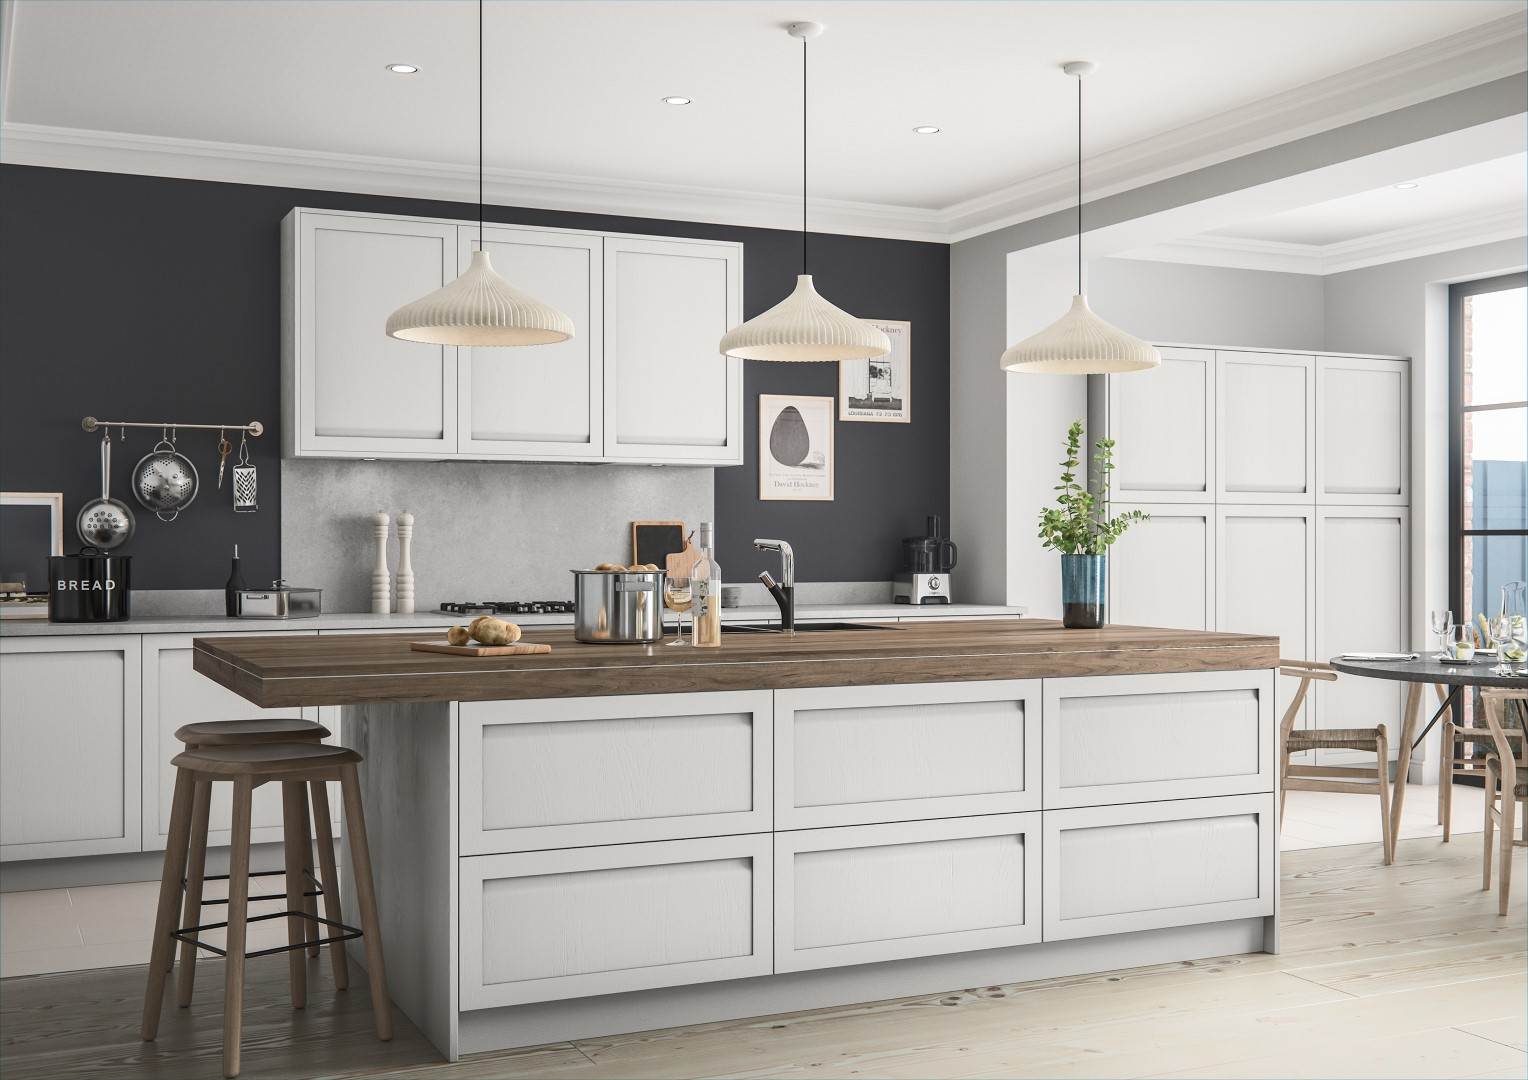 Harborne Light Grey - Kitchen Design - Alan Kelly Kitchens - Waterford - 1